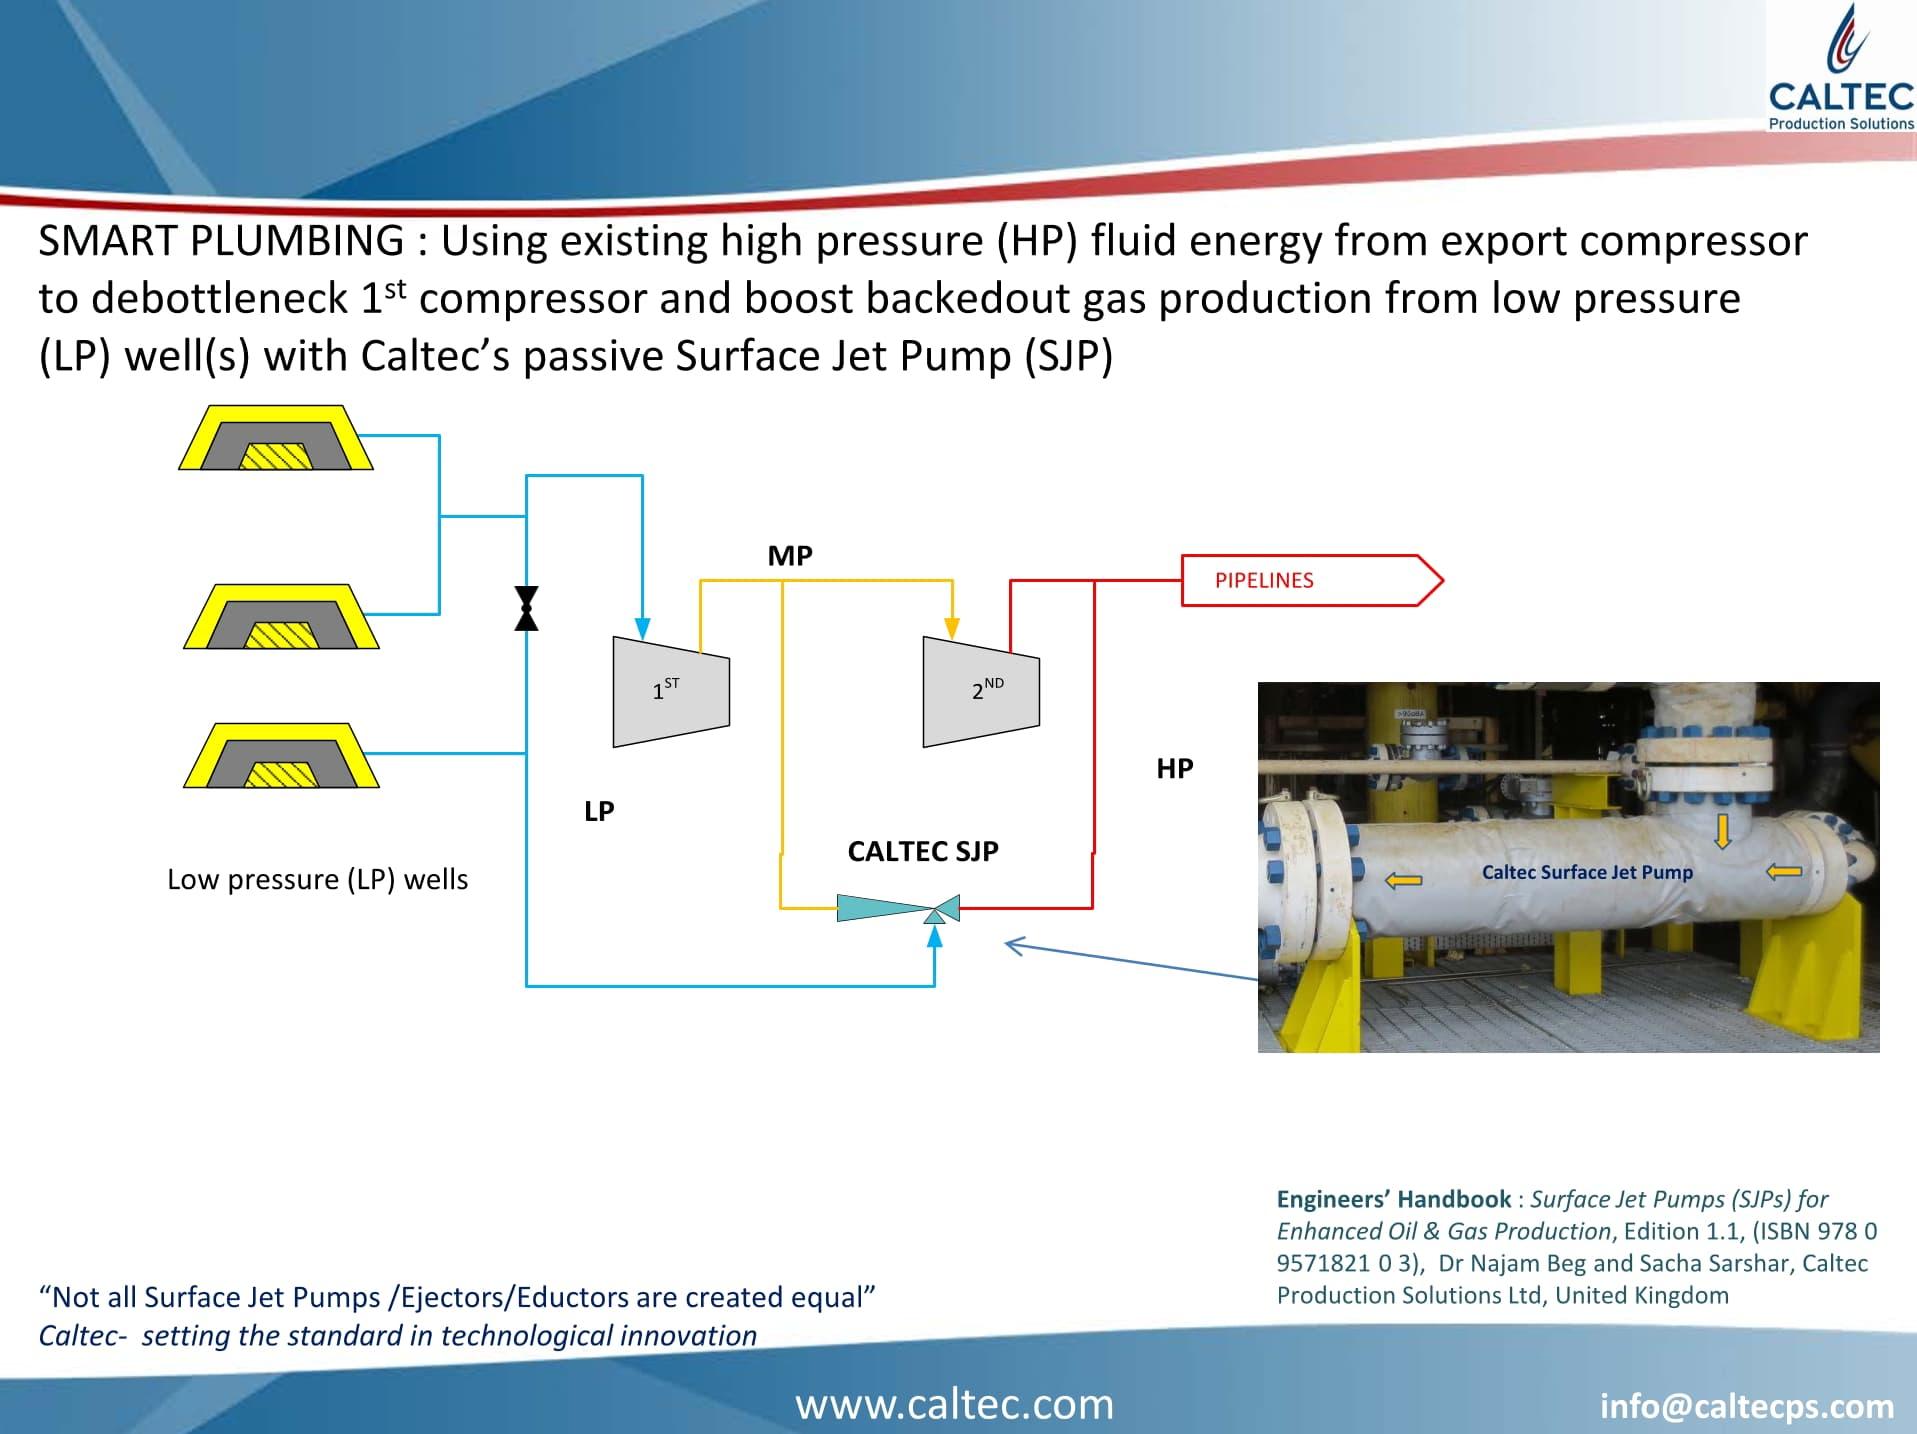 Smart Plumbing with Caltec Surface Jet Pump